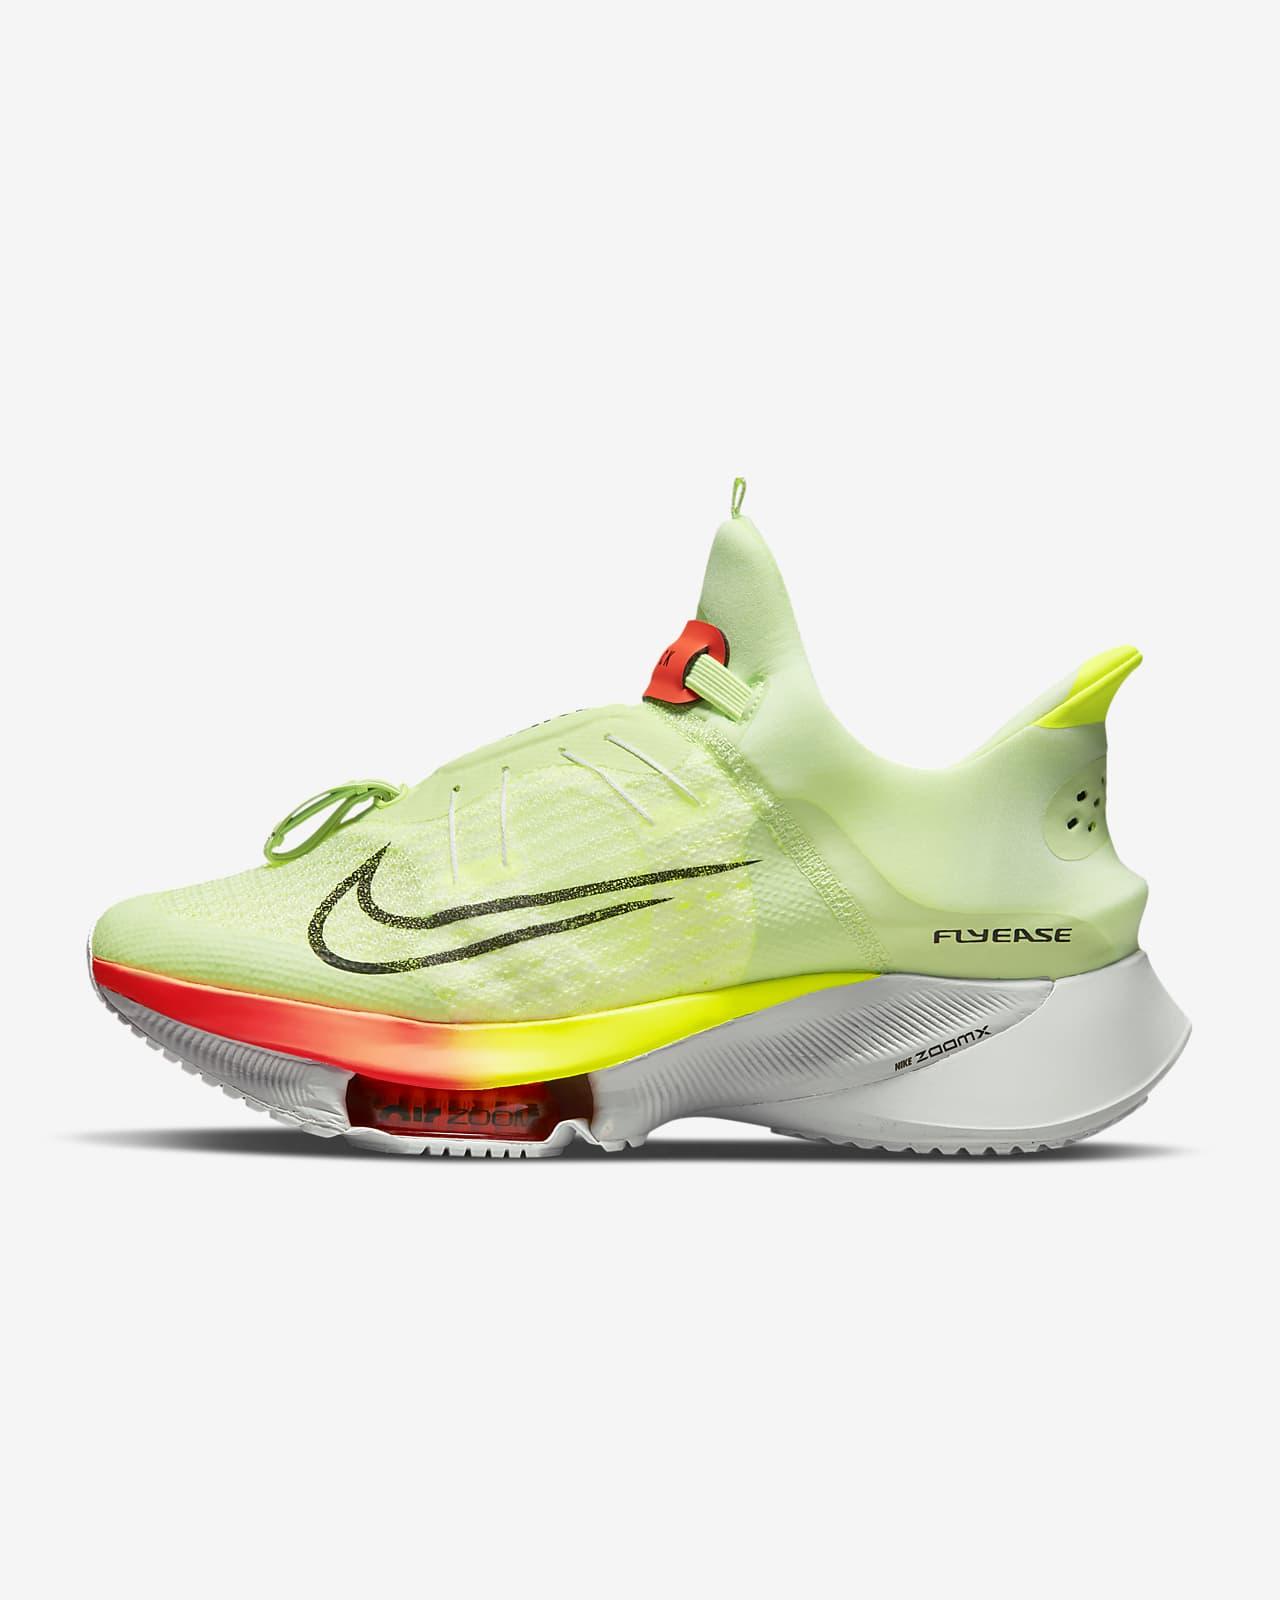 Мужские беговые кроссовки Nike Air Zoom Tempo NEXT% FlyEase